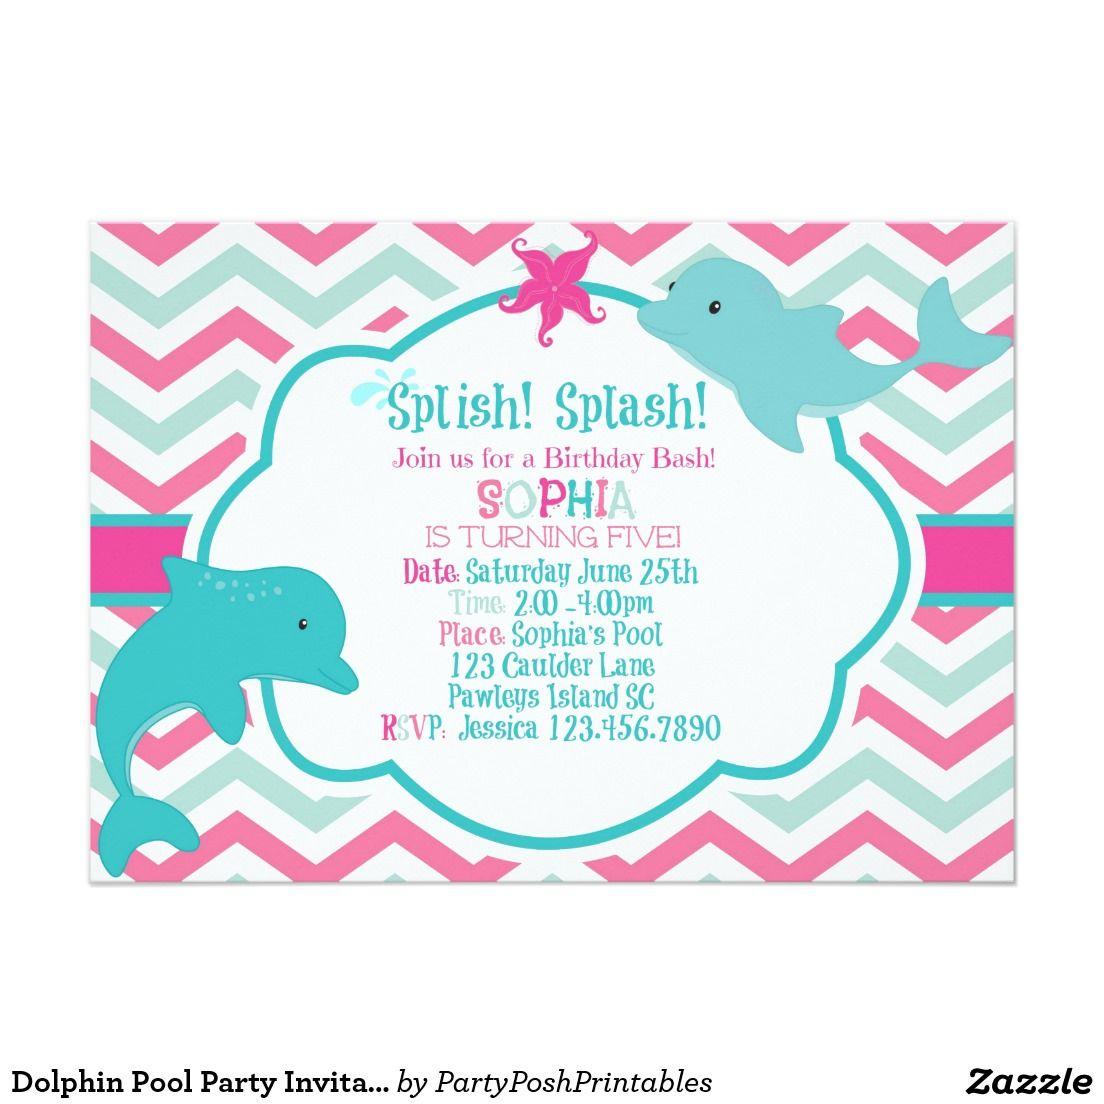 Dolphin Pool Party Invitation Pink Aqua Chevron | Birthday ideas ...